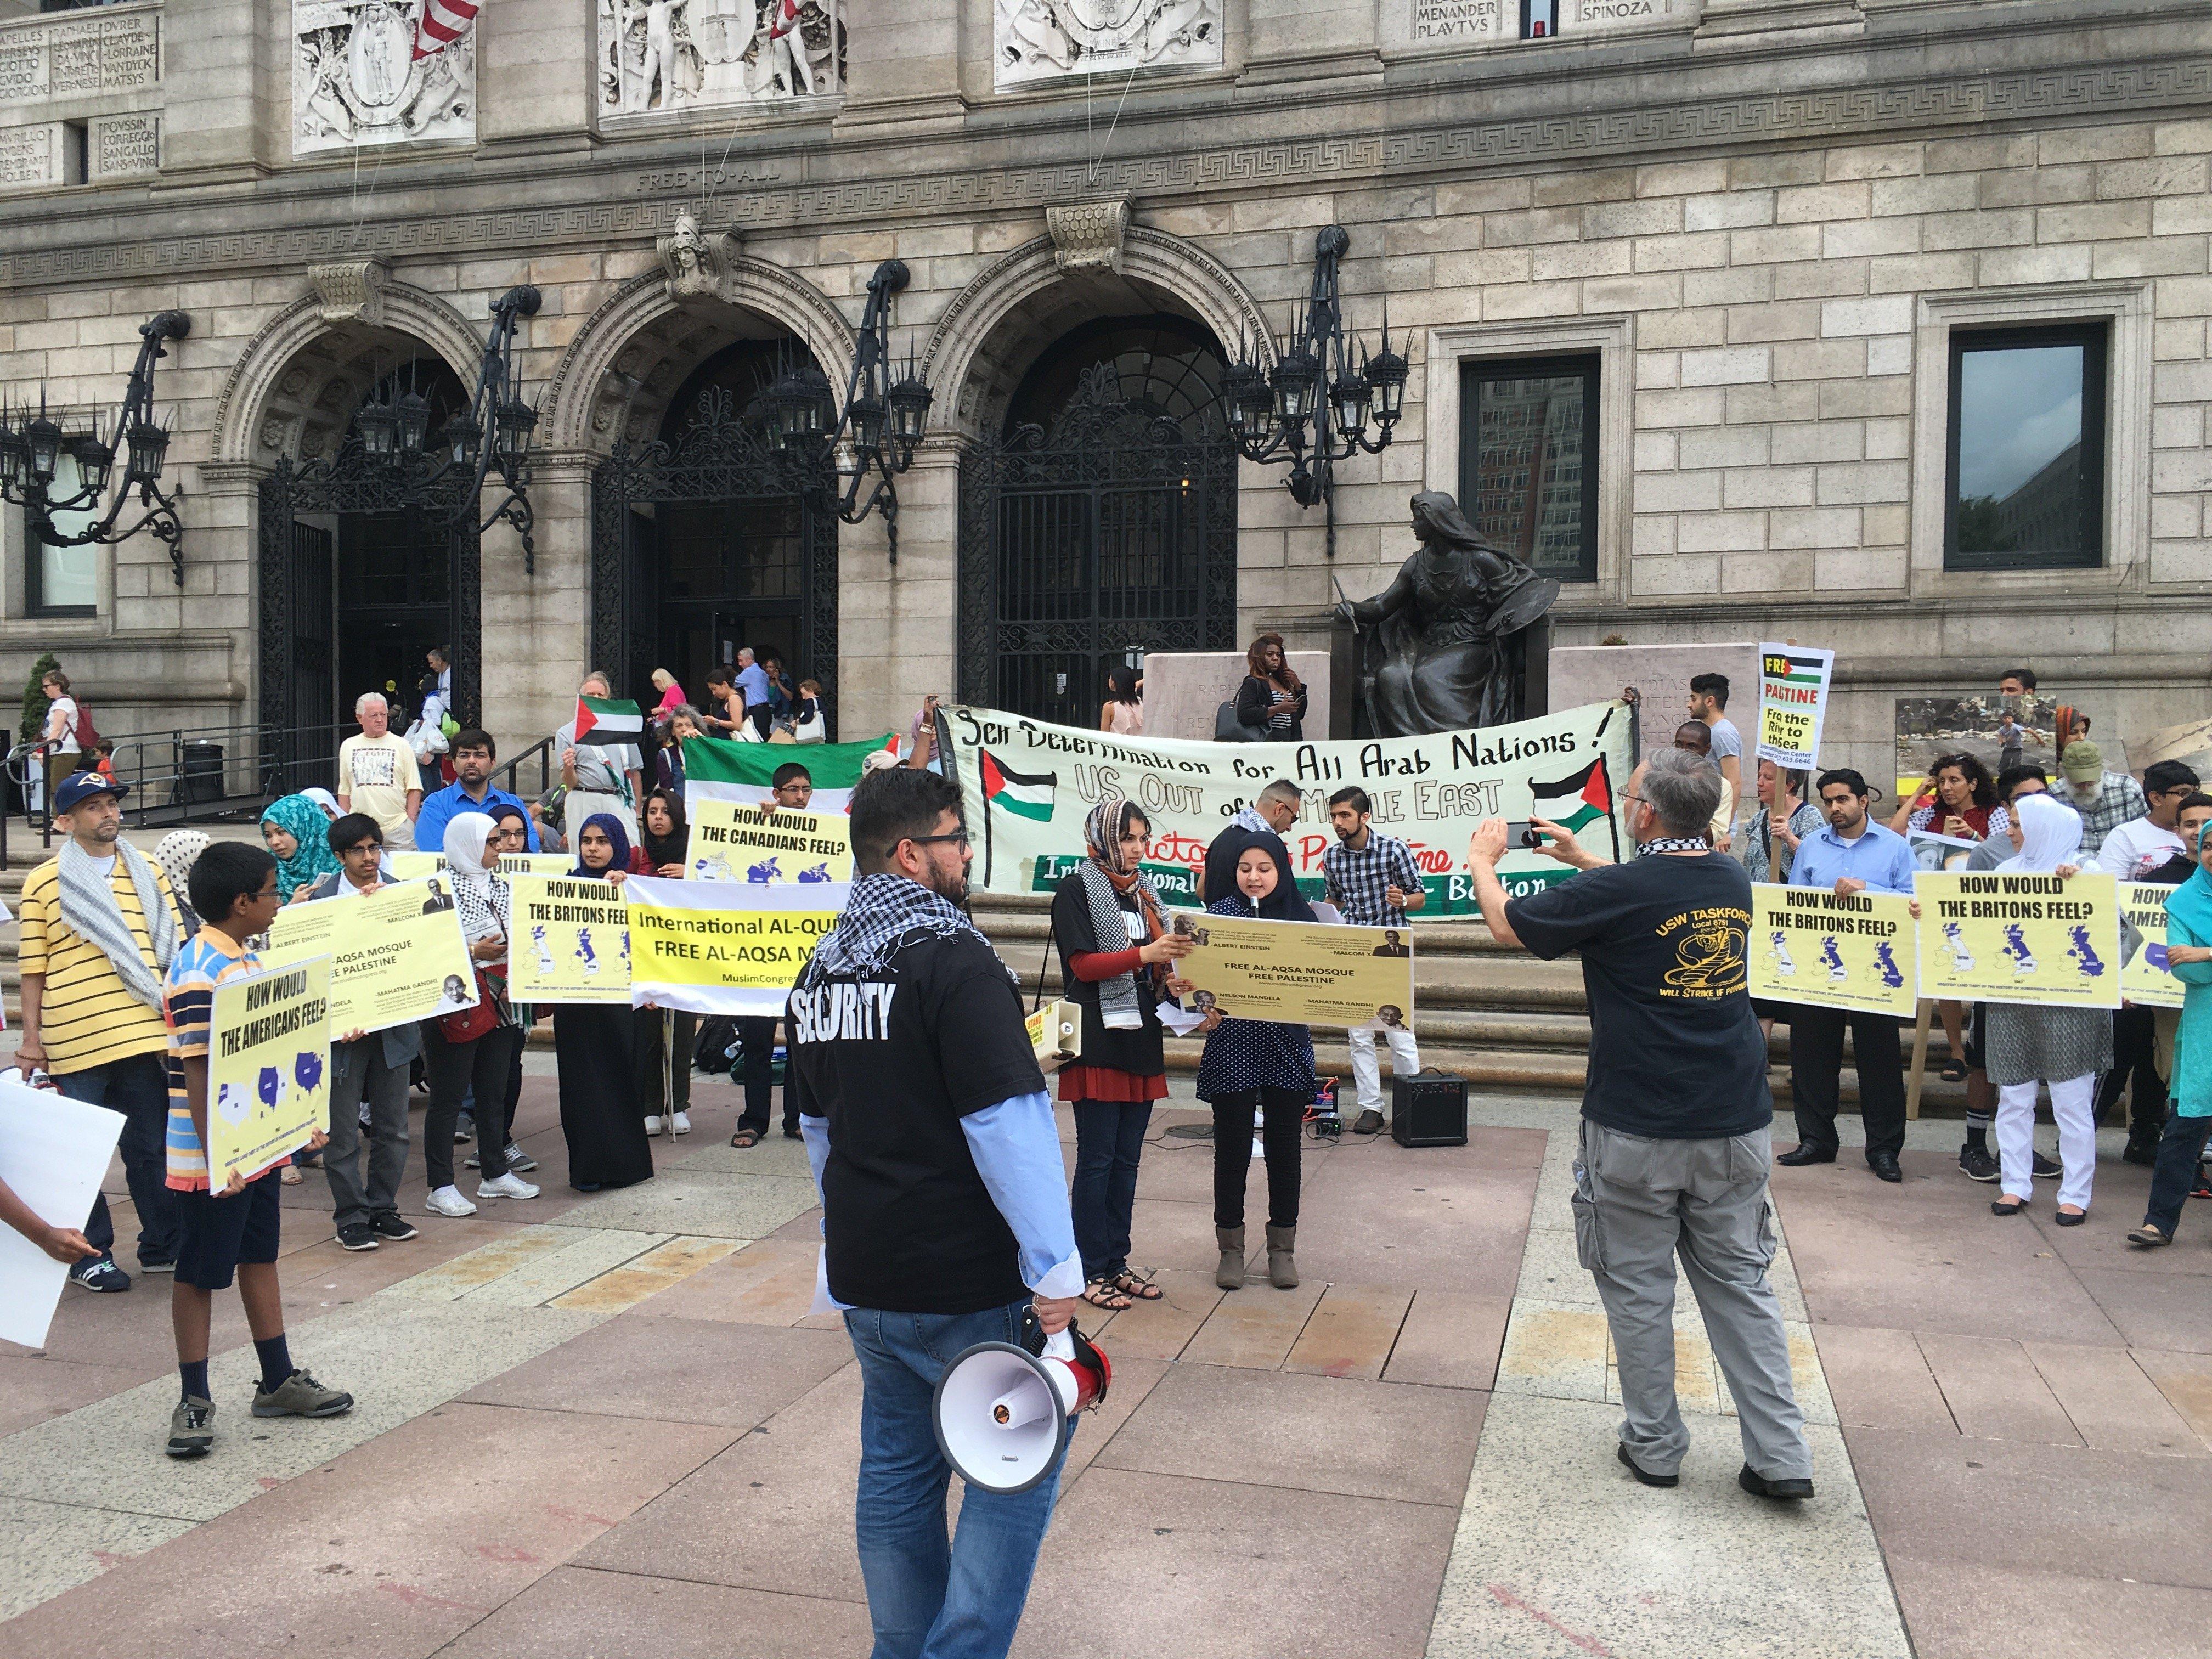 Boston\'s Al Quds Day | Americans for Peace and Tolerance